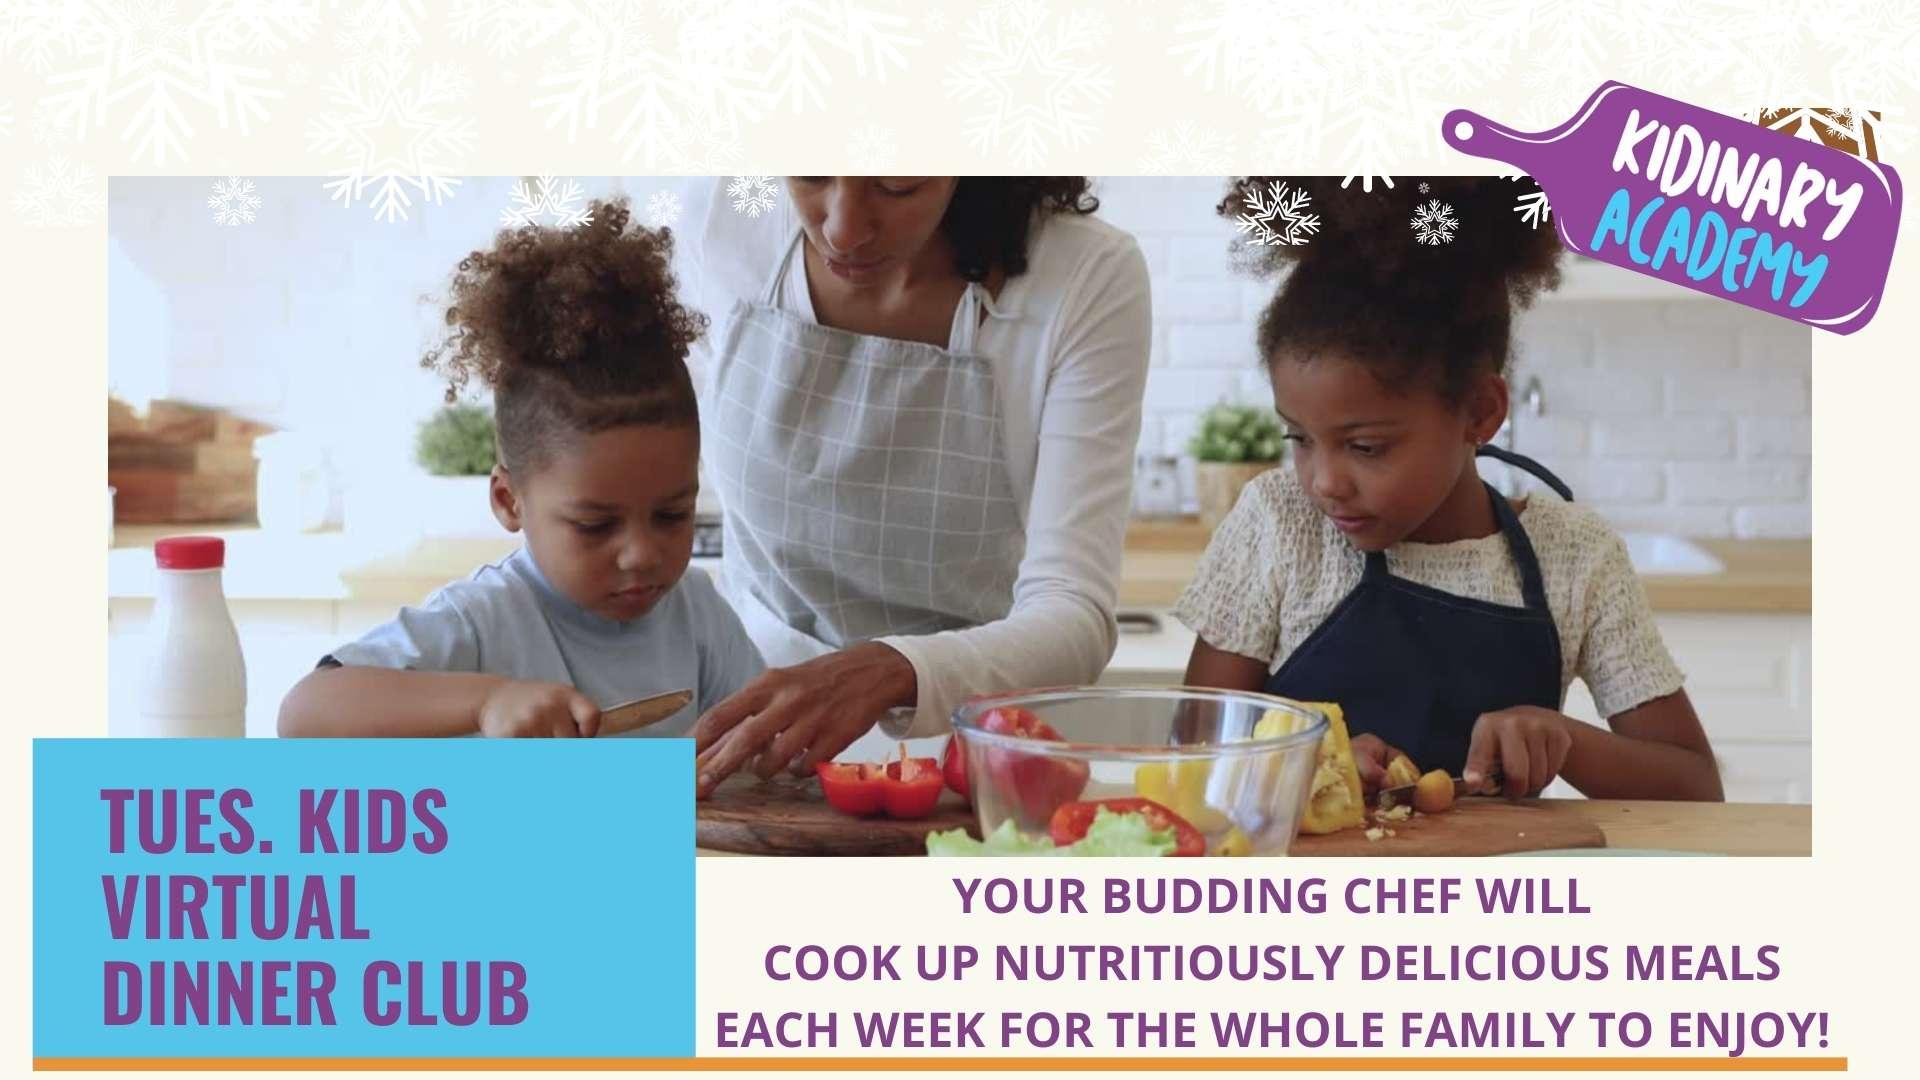 Tuesday Kids Virtual Dinner Club